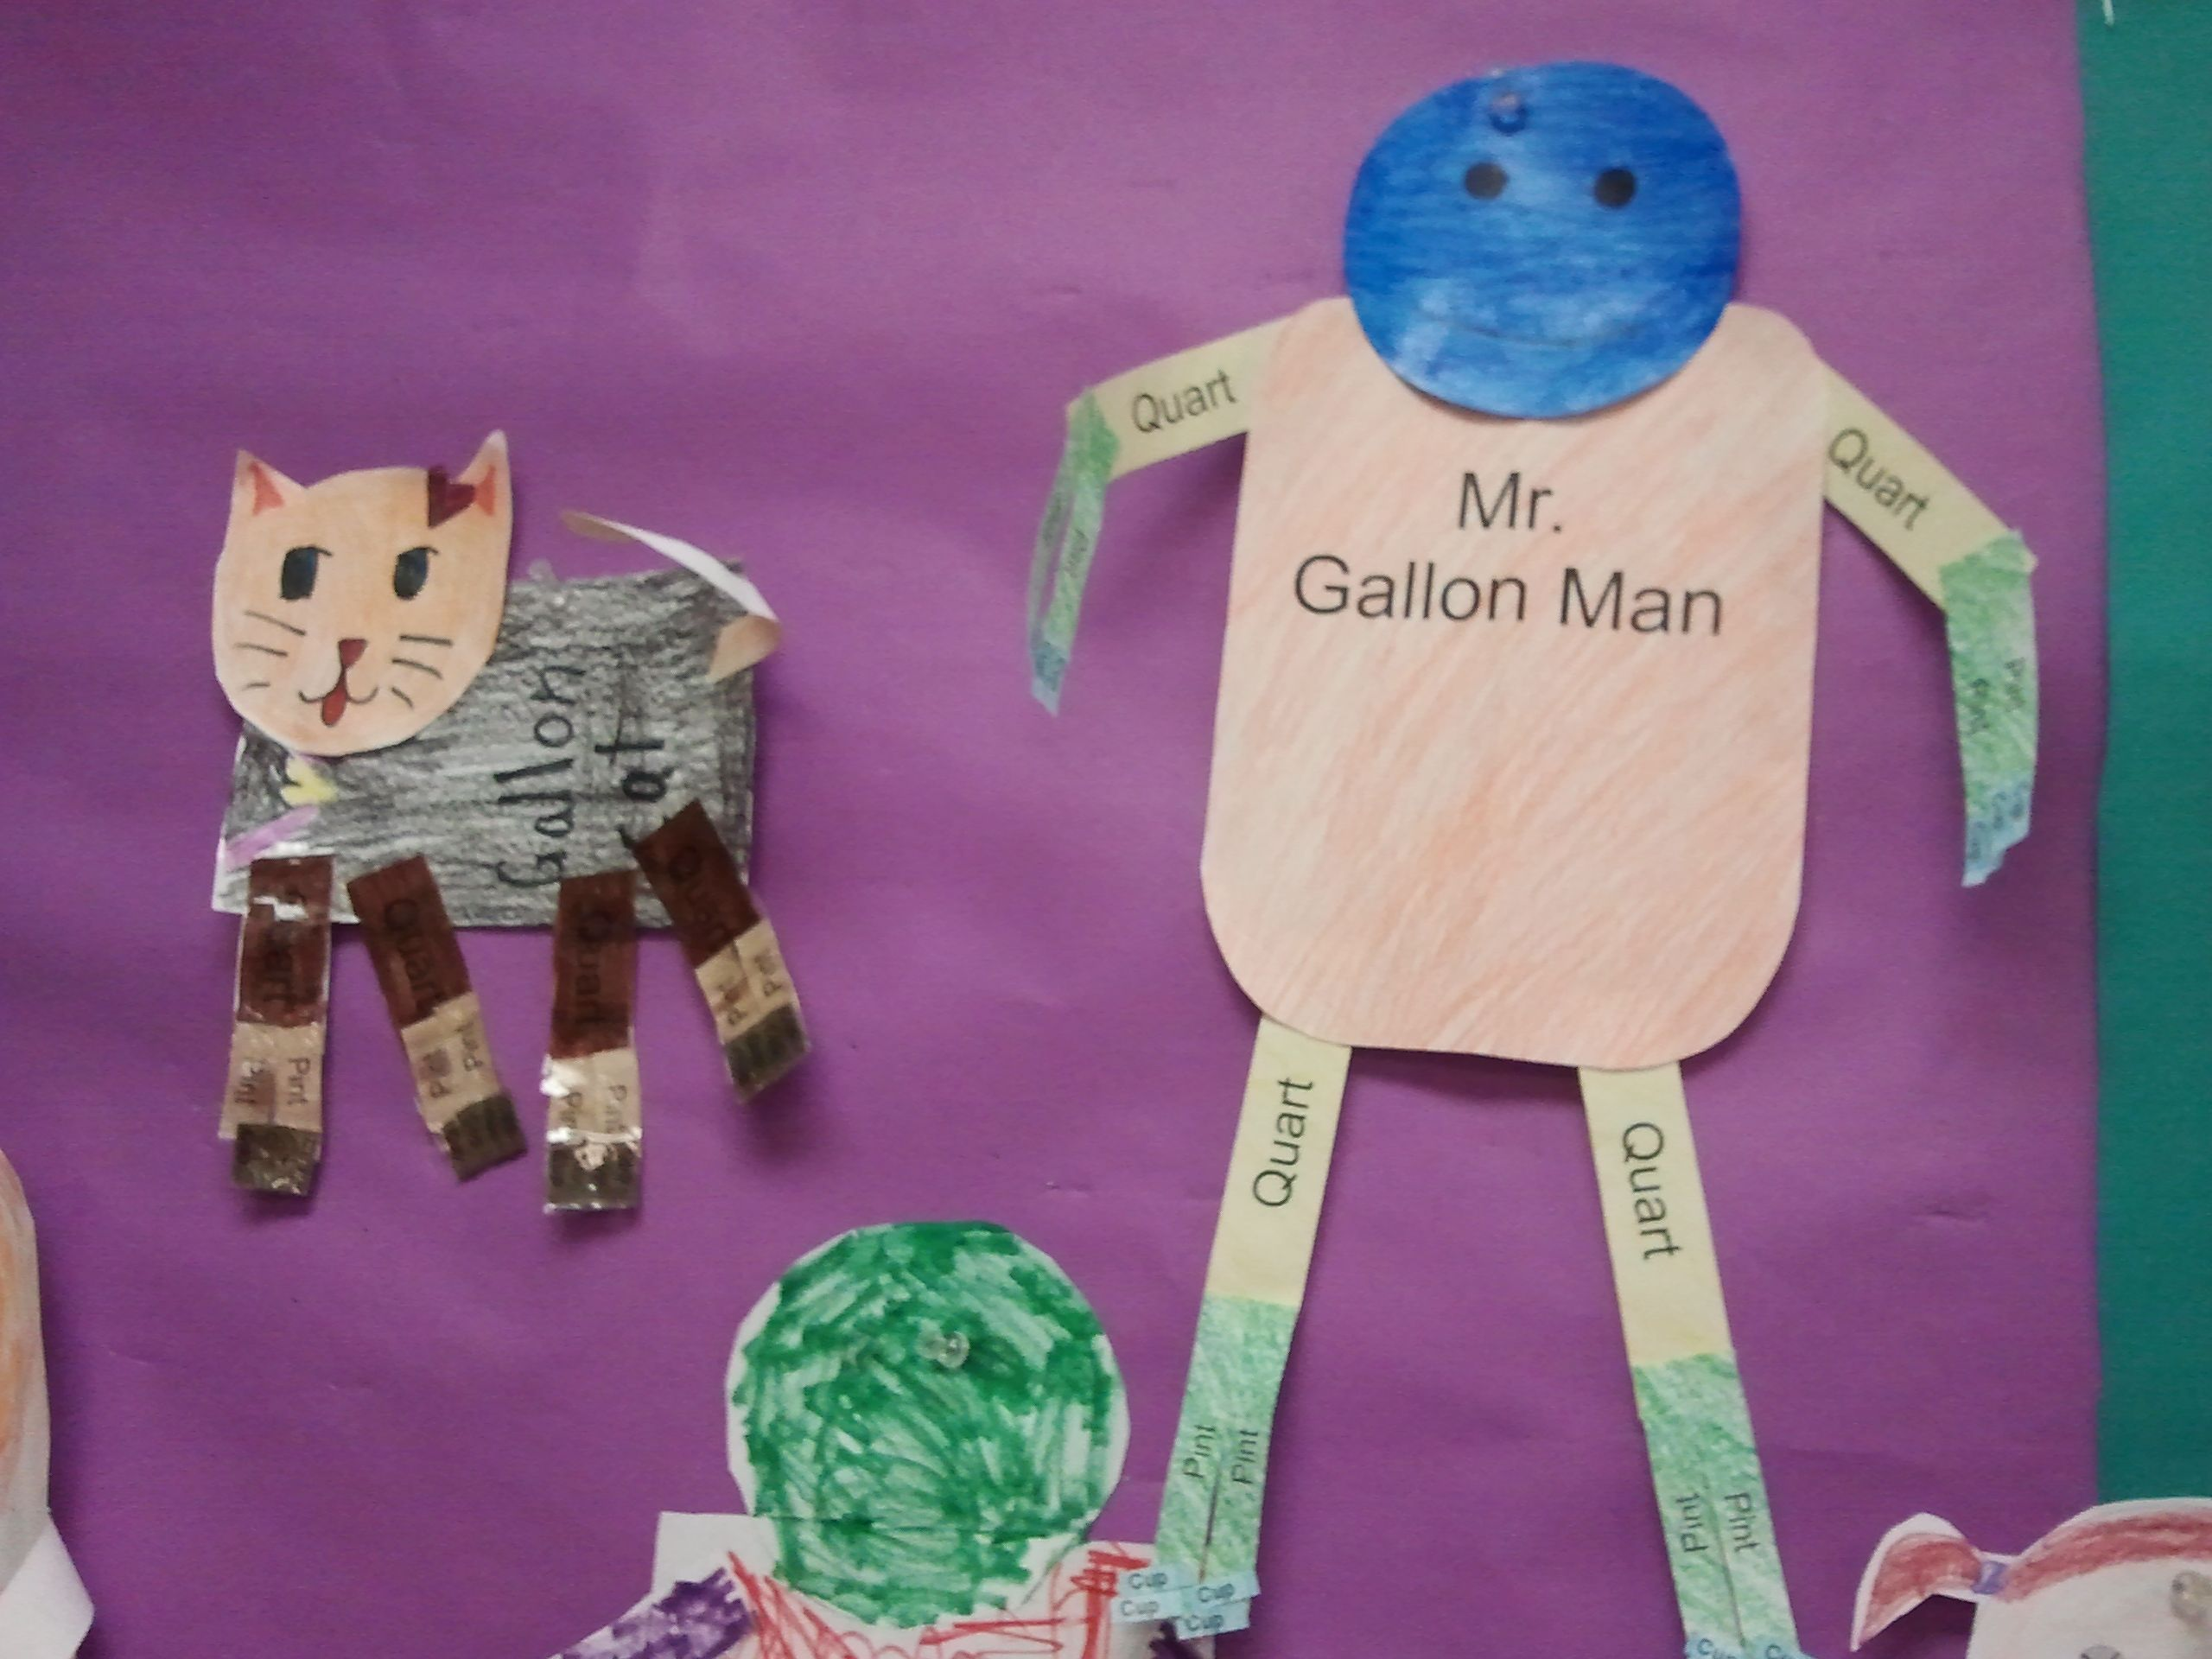 More Gallon Man Cat Examples